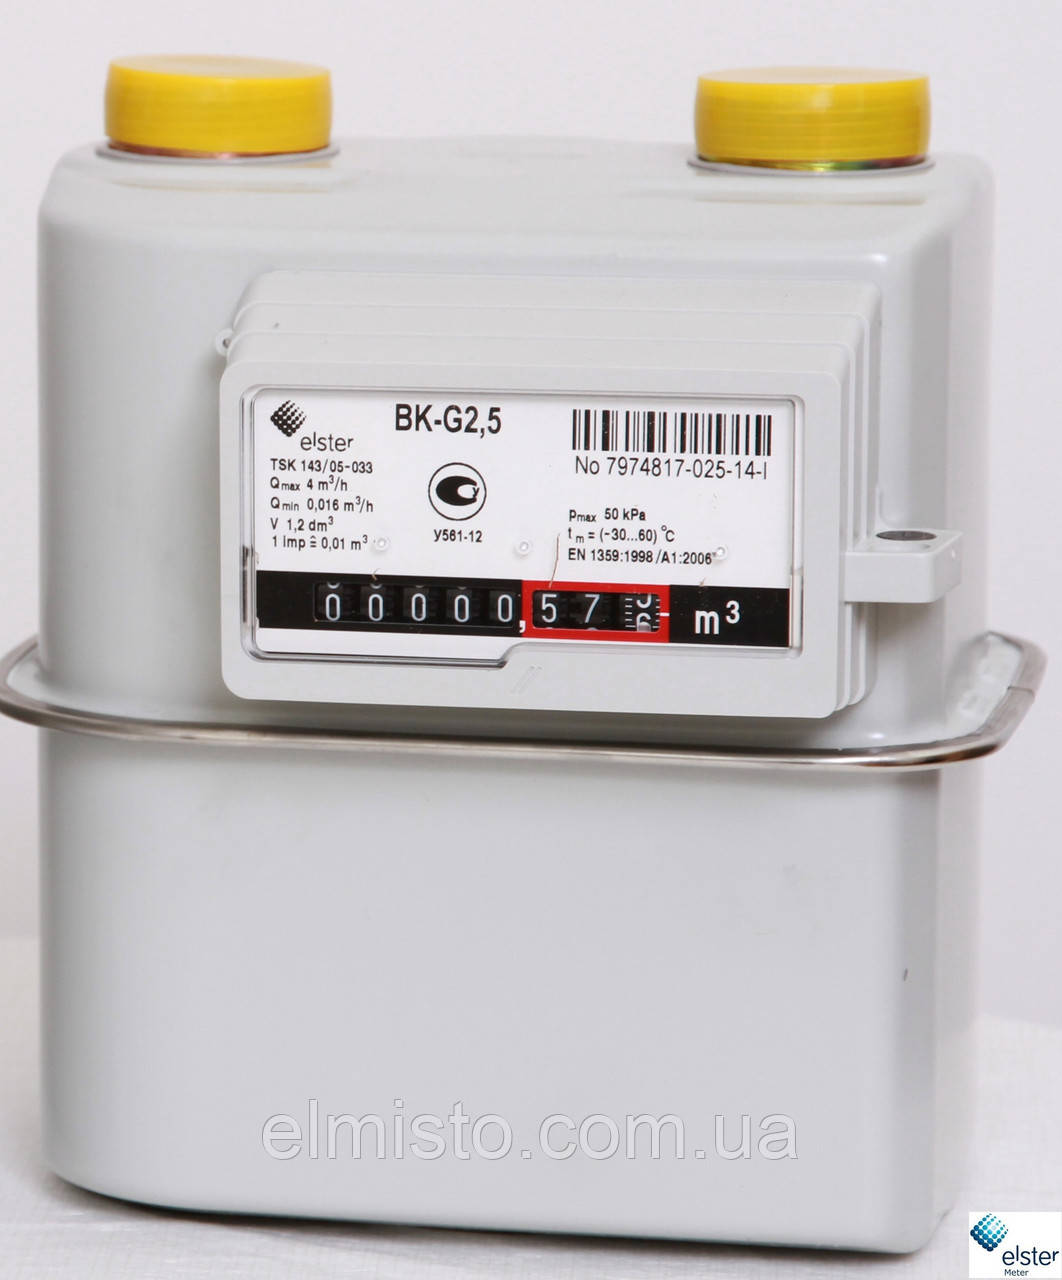 счетчик газа вк g16 цена